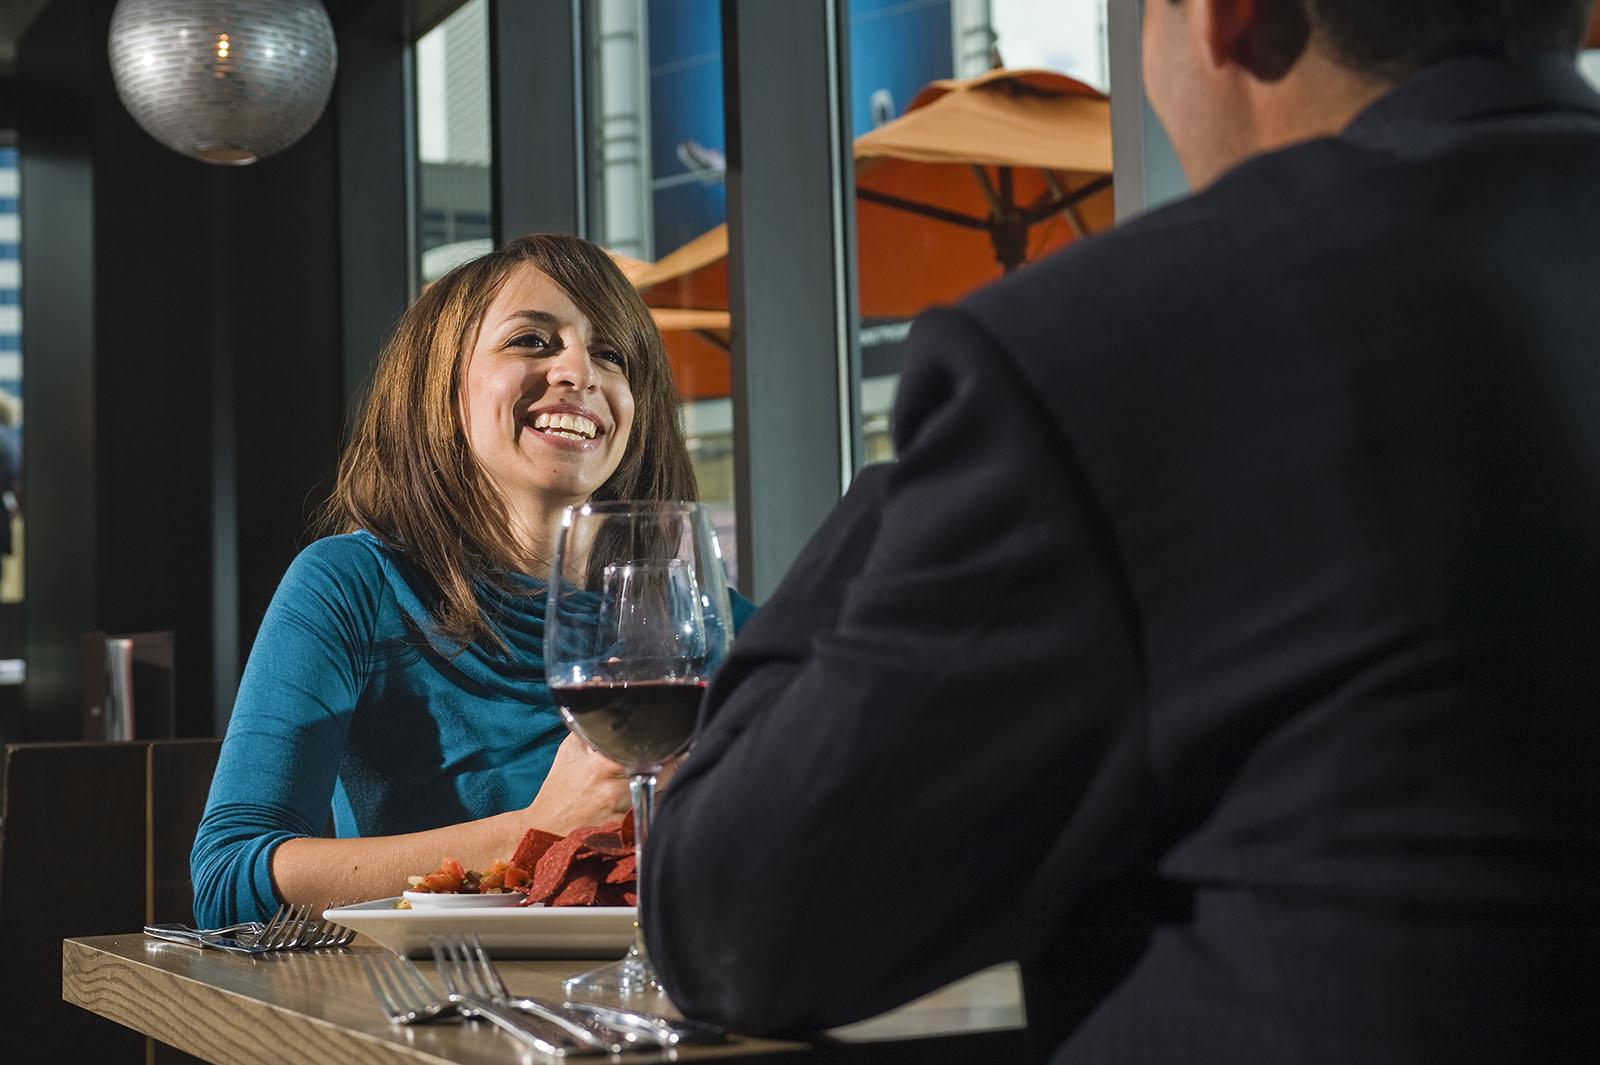 Couple dining at Milestones Restaurant, Toronto, ON